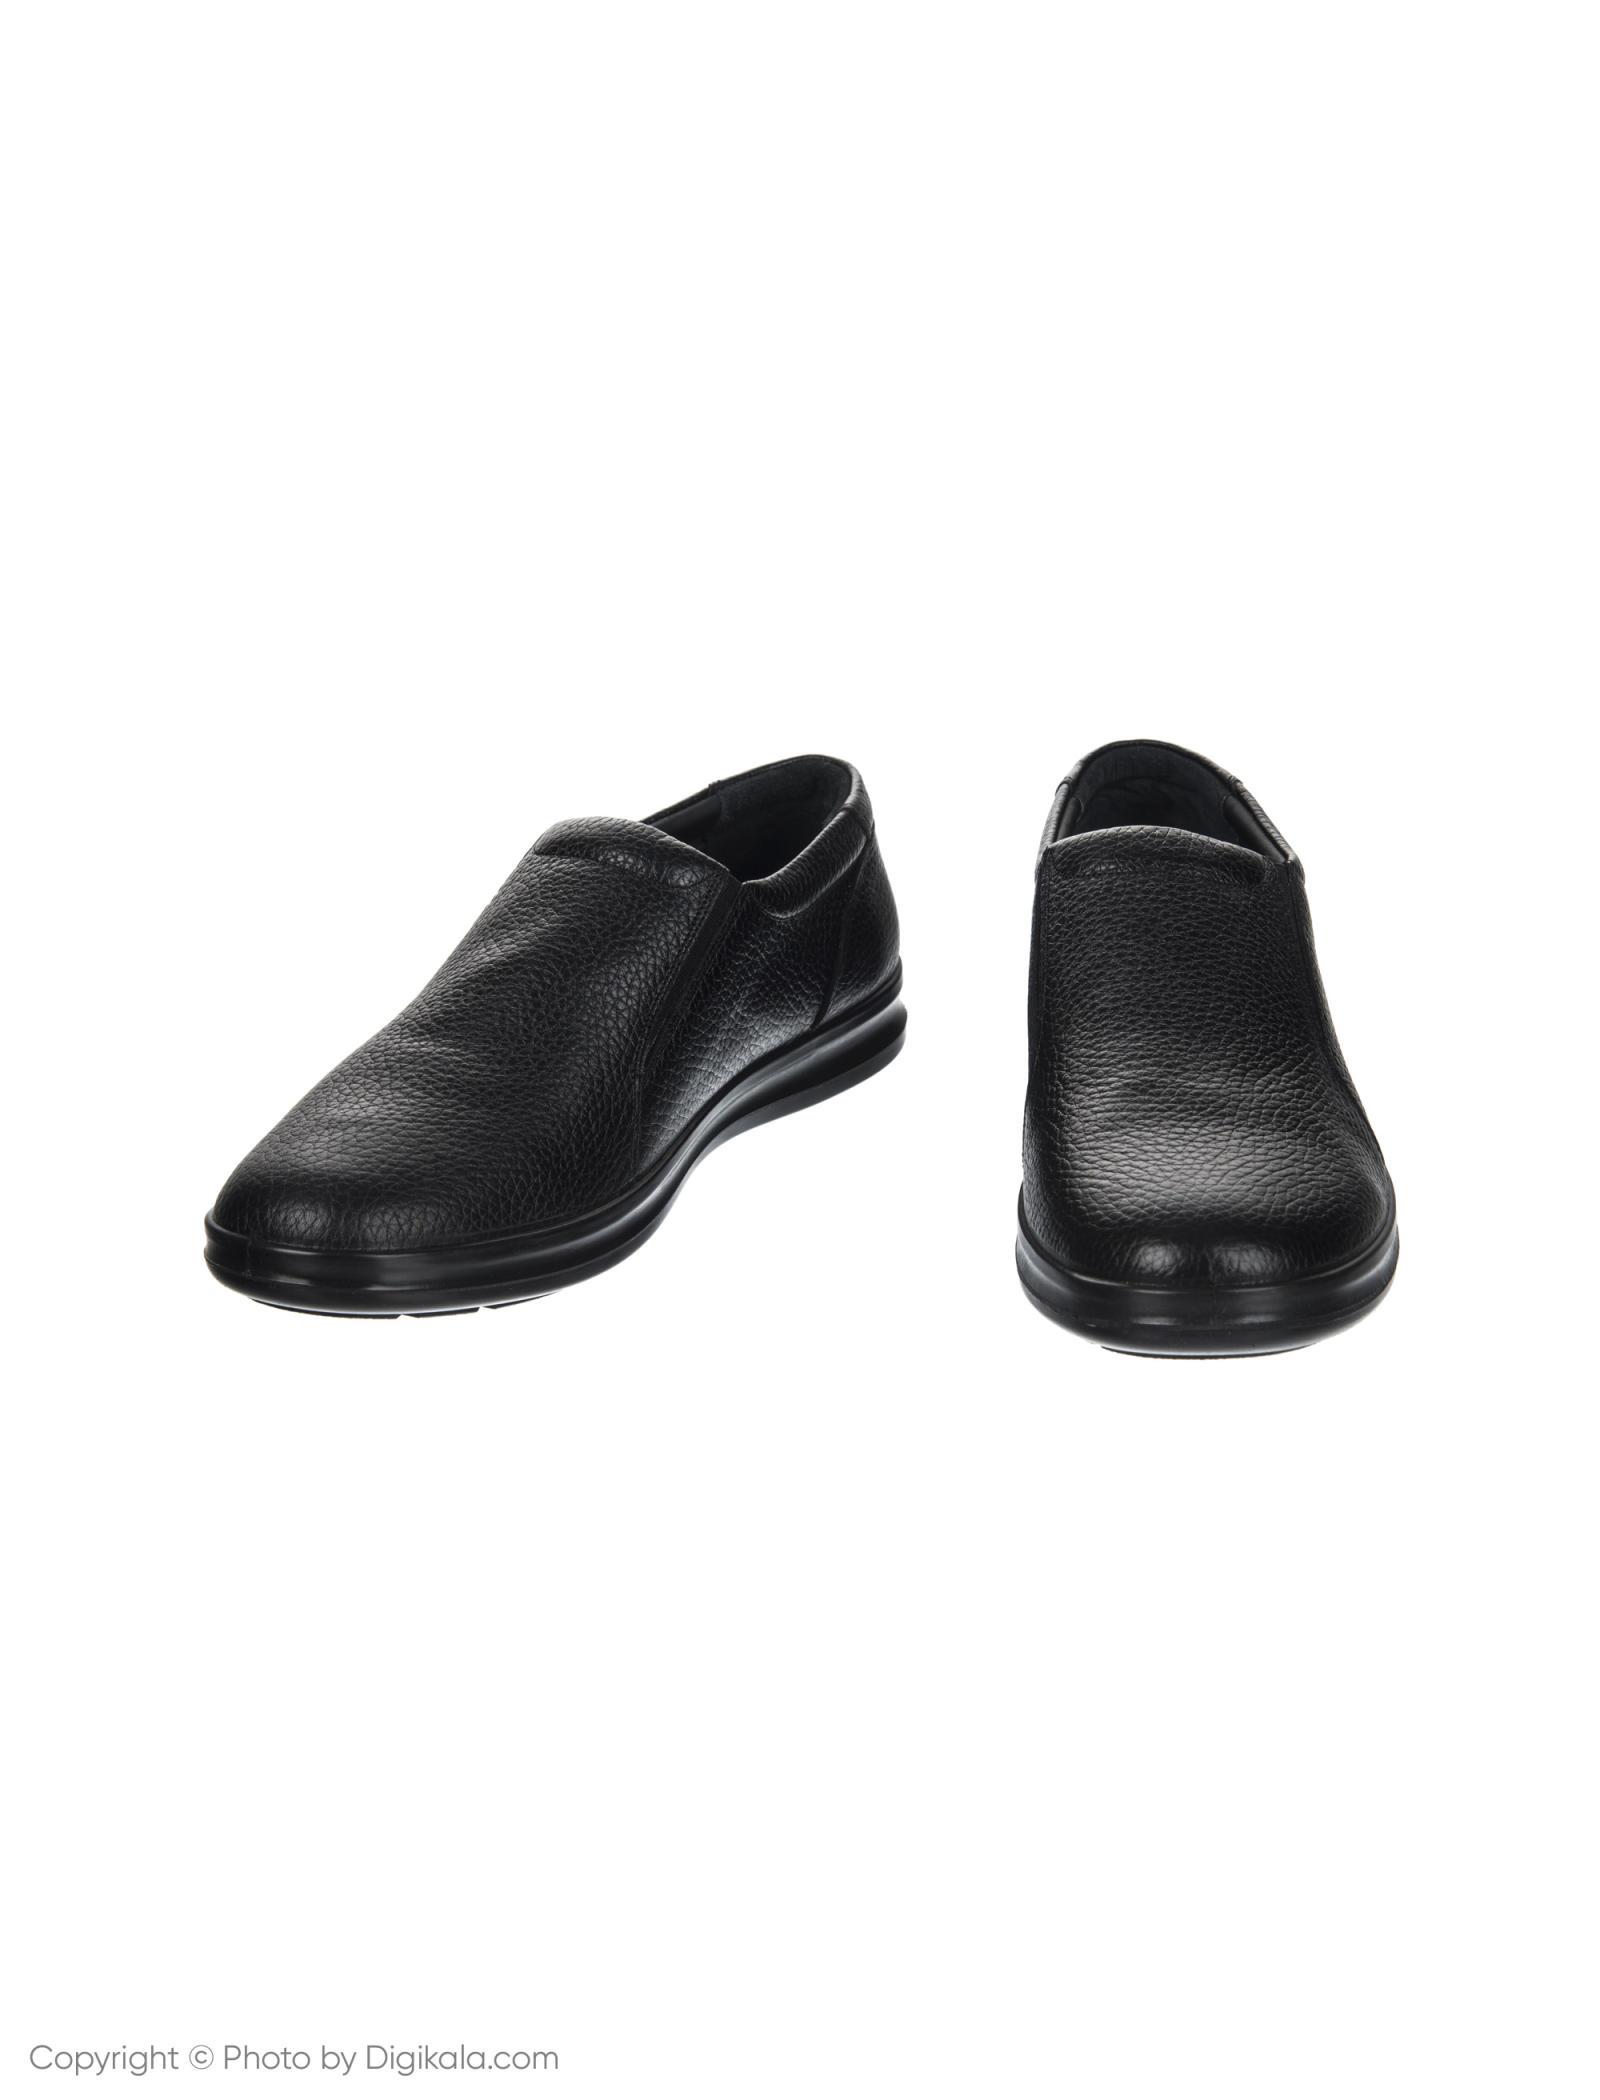 کفش مردانه دنیلی مدل 113110241002 -  - 4